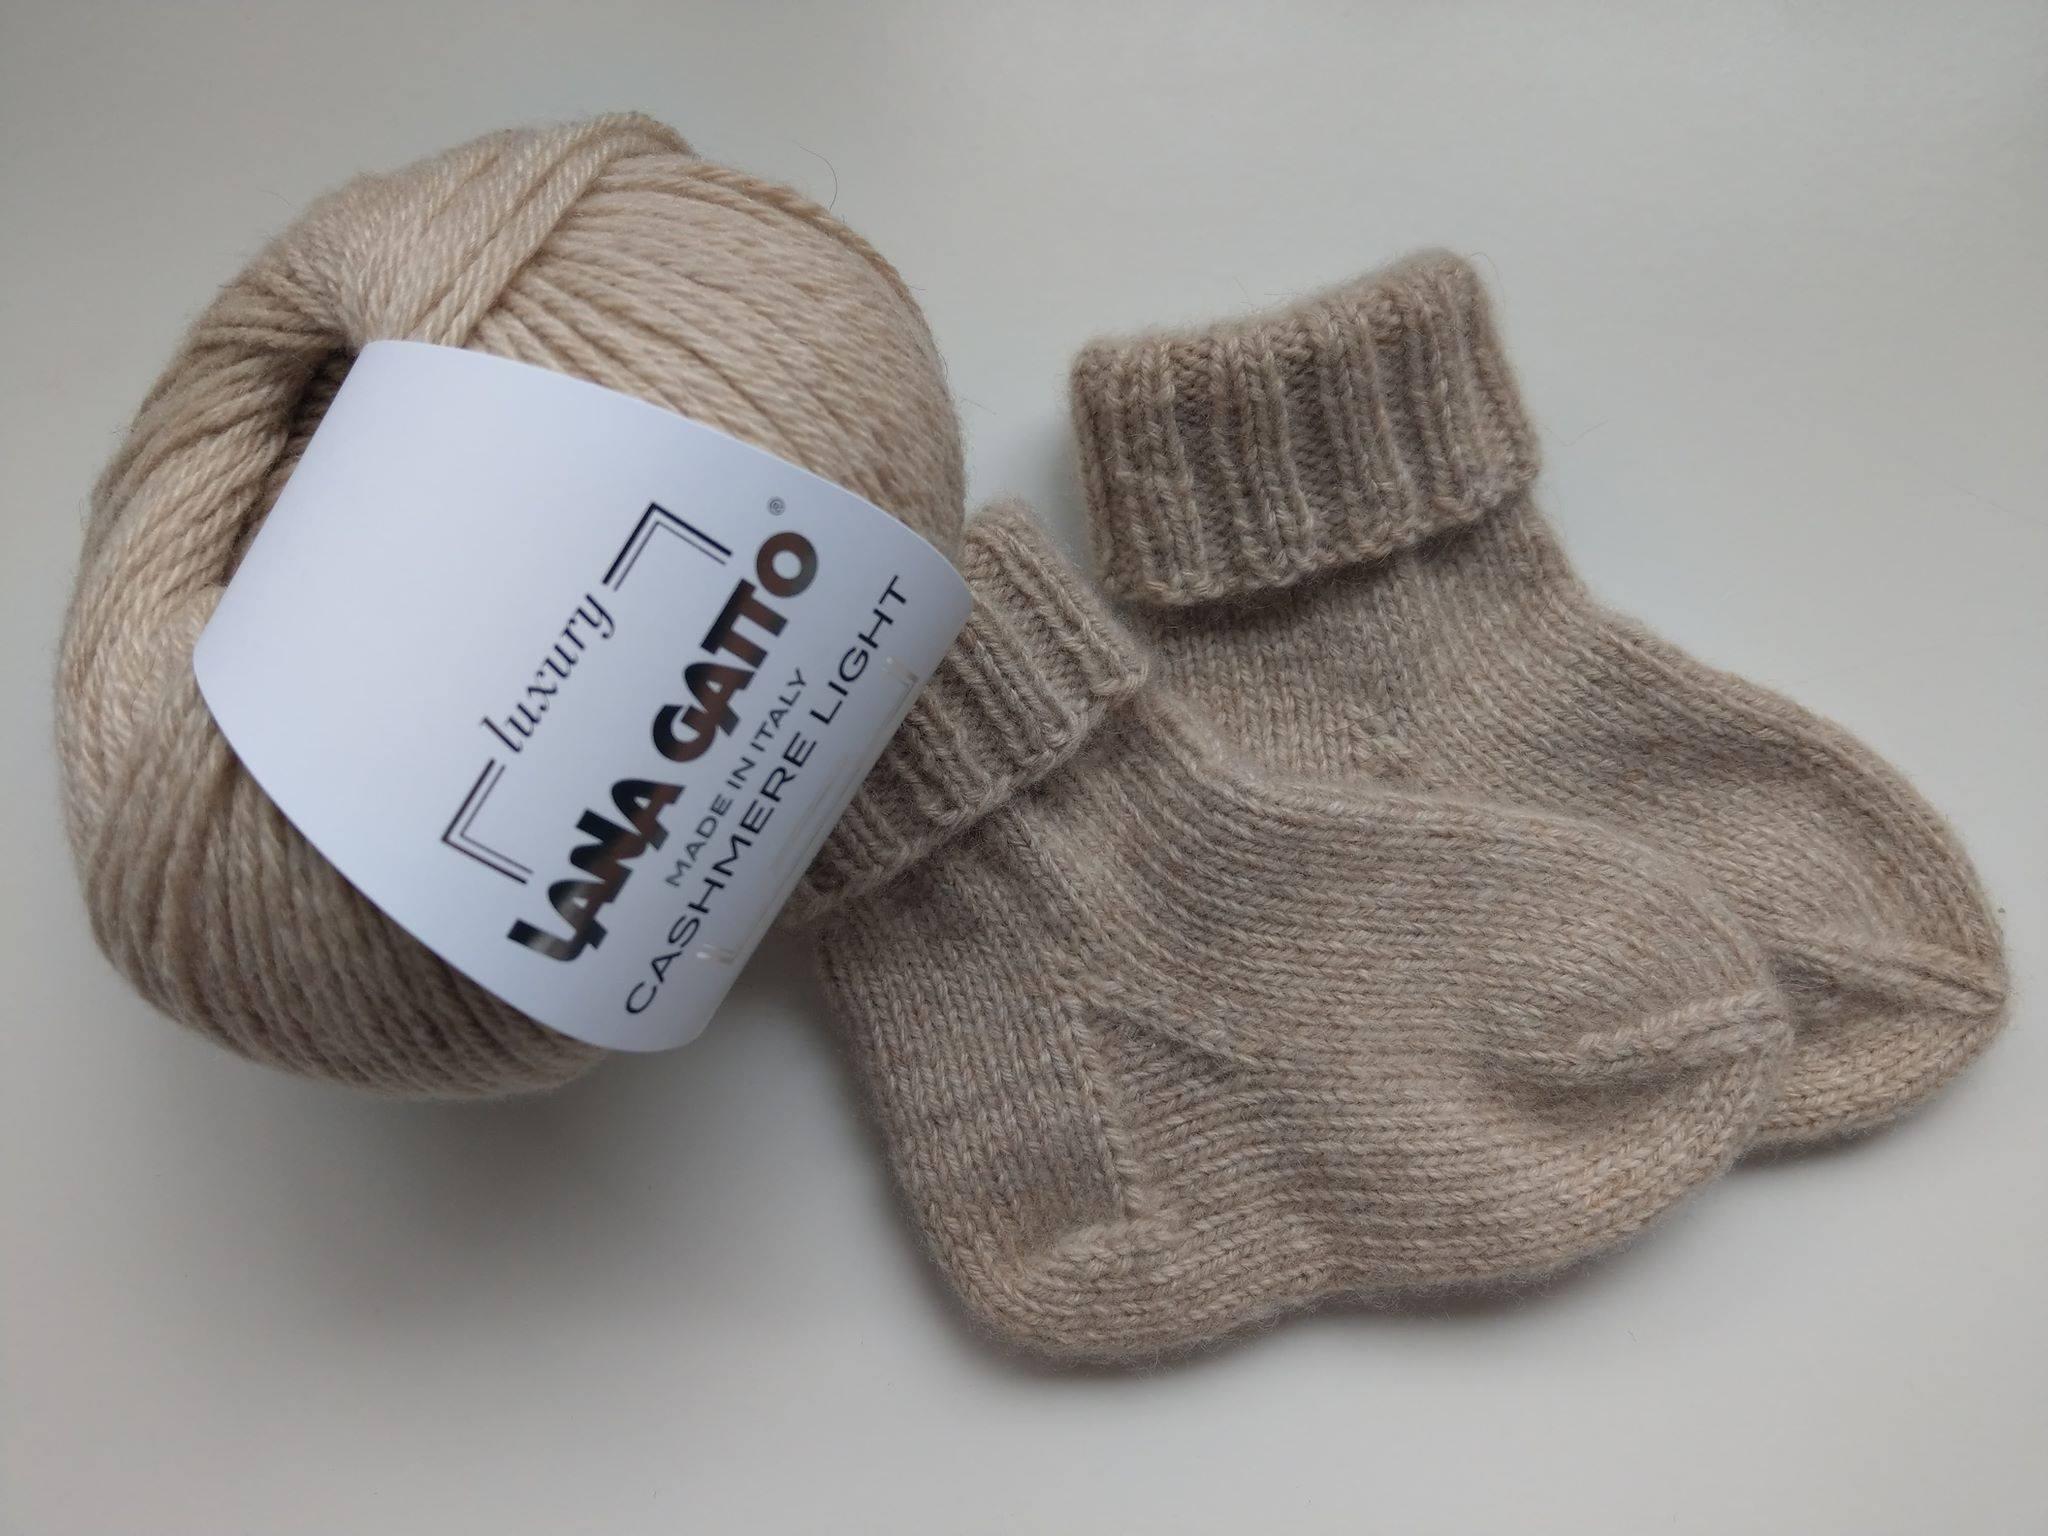 lana-gatto-cashmere-light-socks